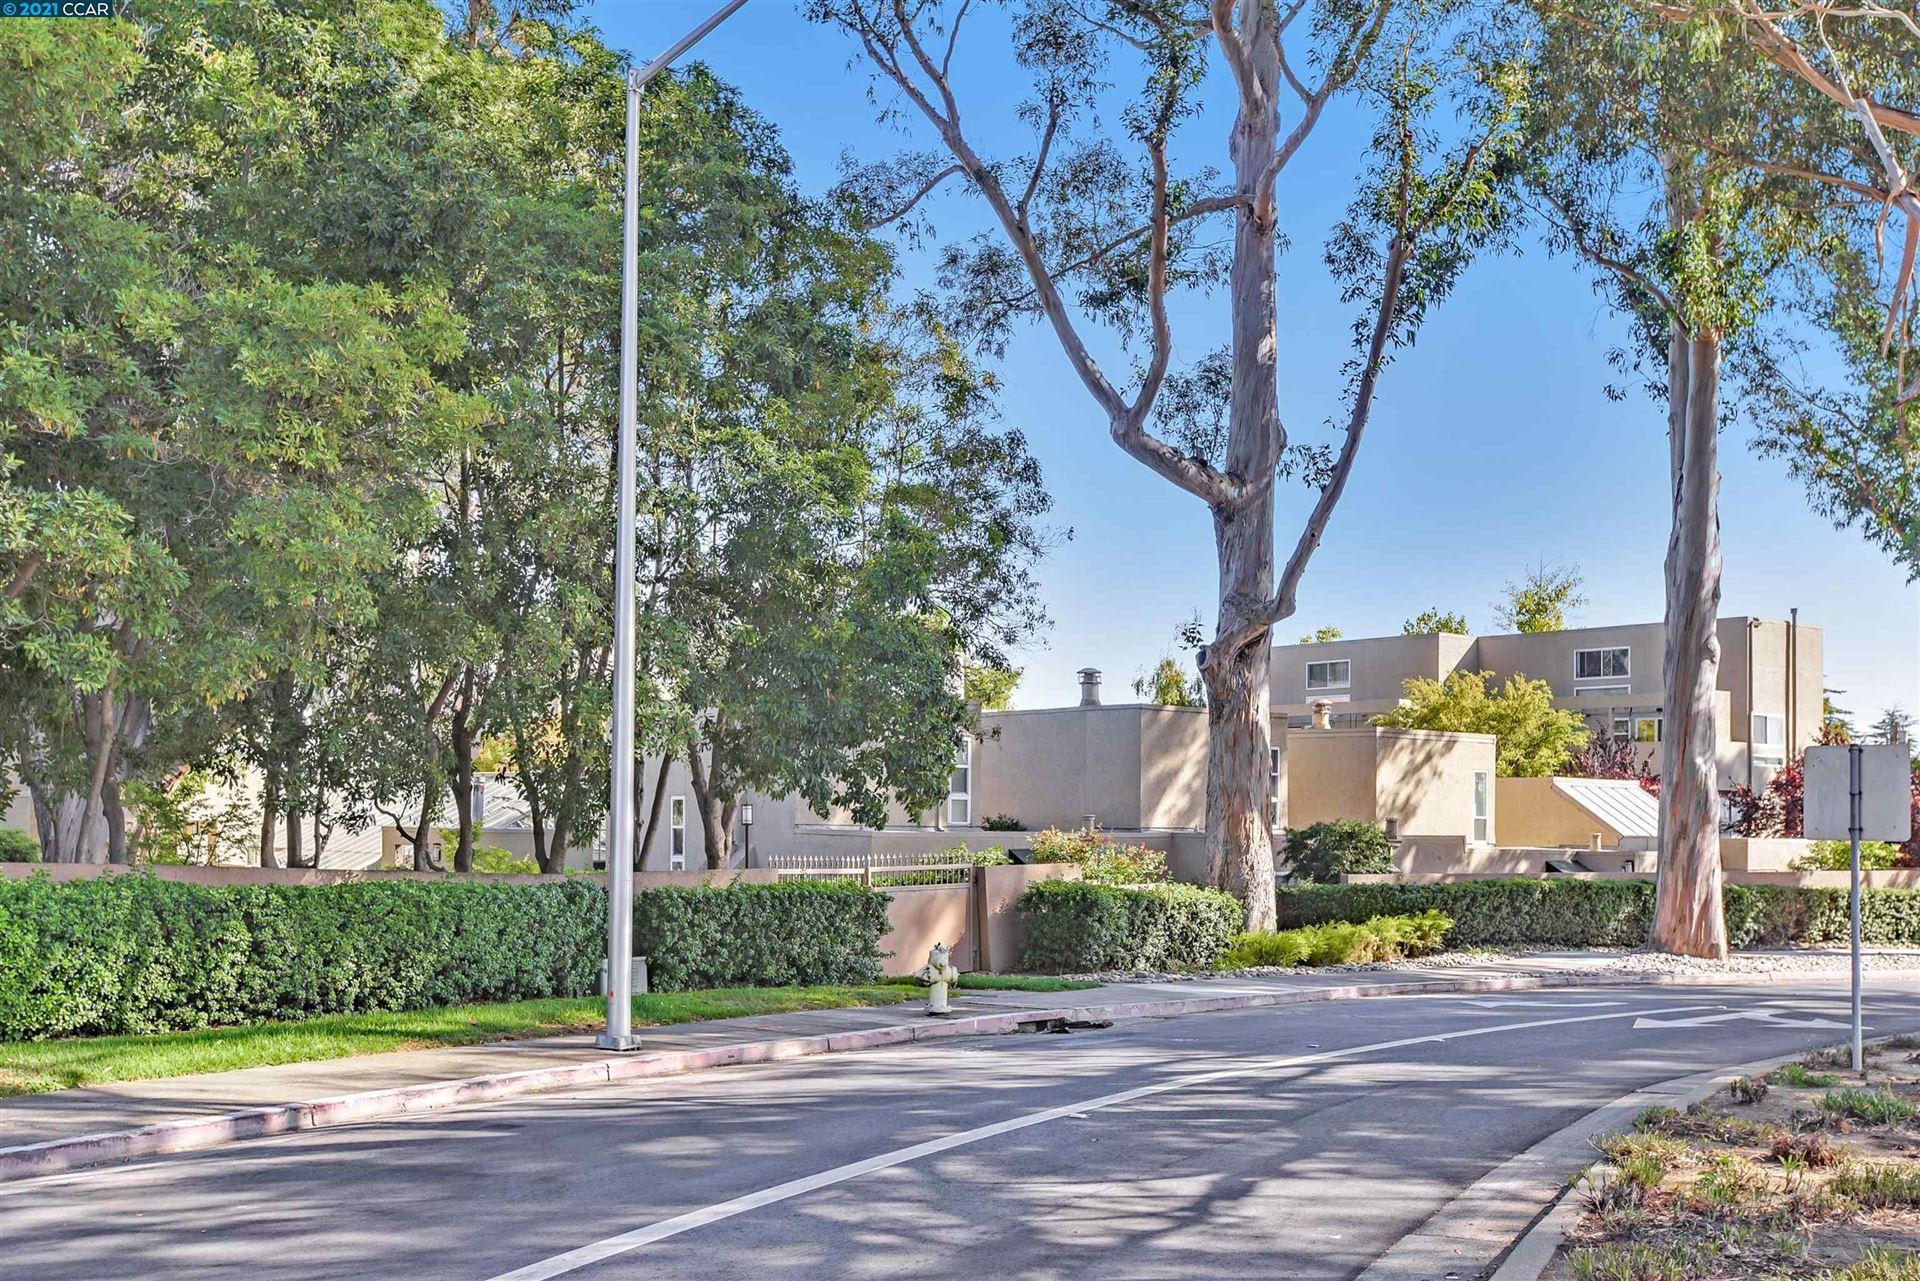 1919 Alameda De Las Pulgas #Unit 3, San Mateo, CA 94403 - #: 40965748